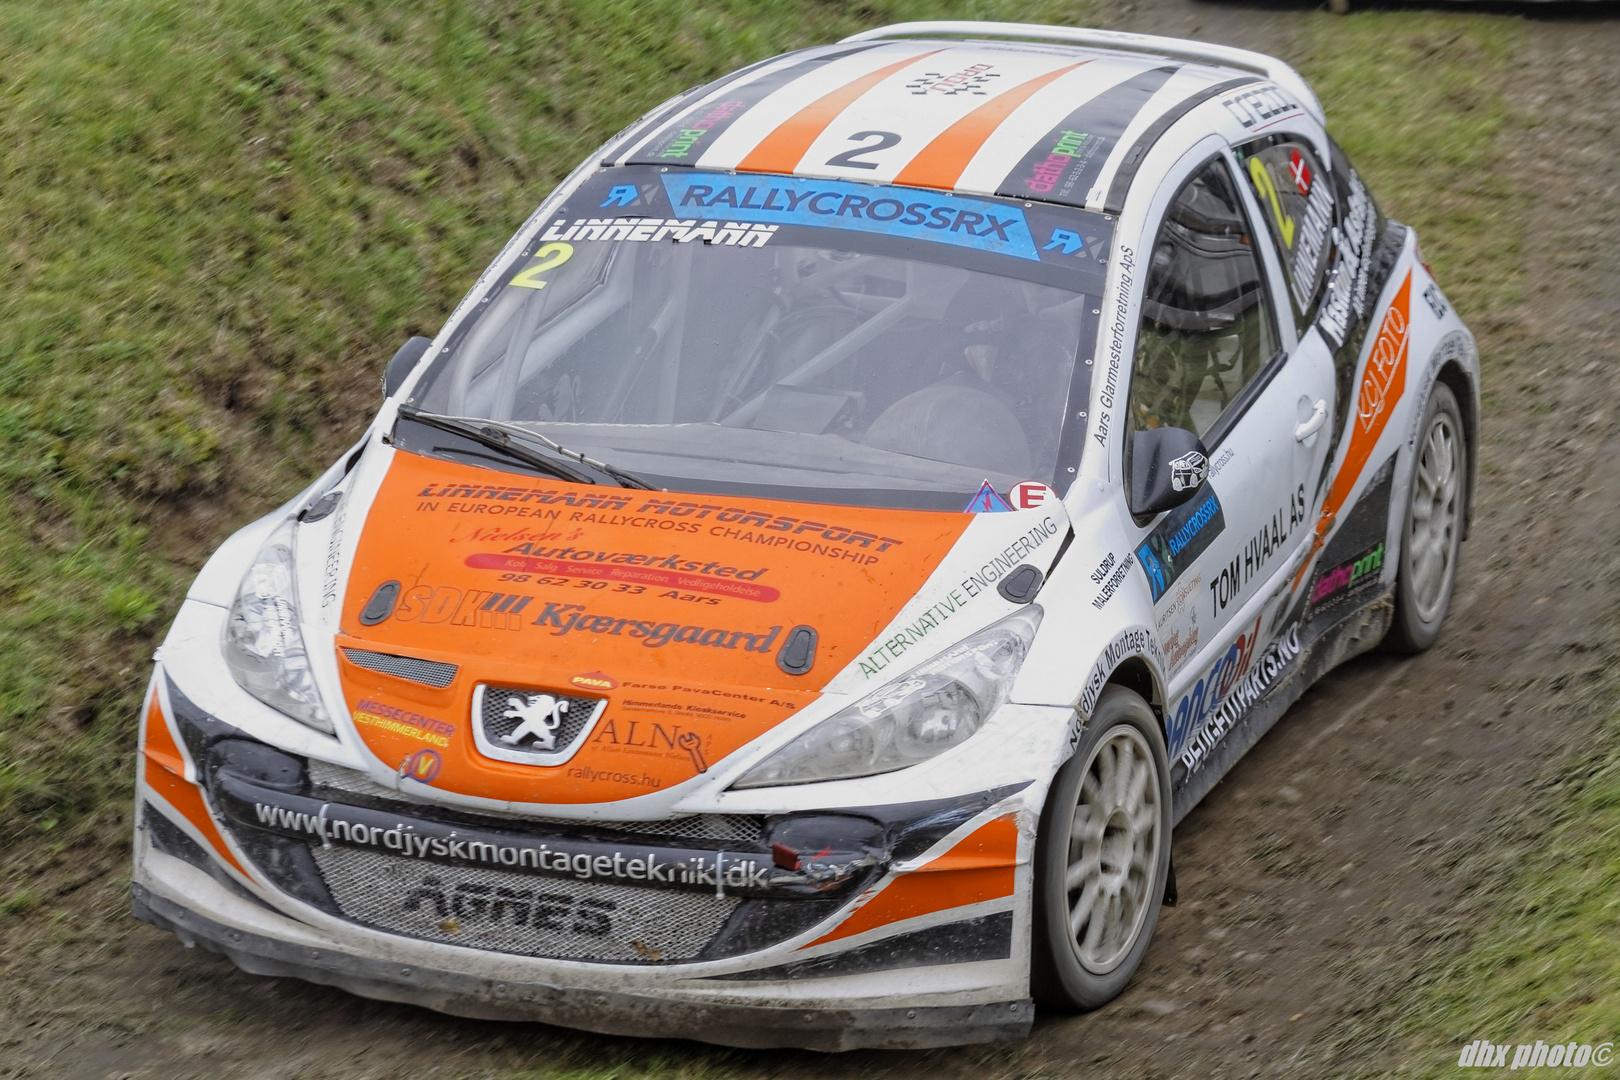 Ulrik Linnemann in his Peugeot 207